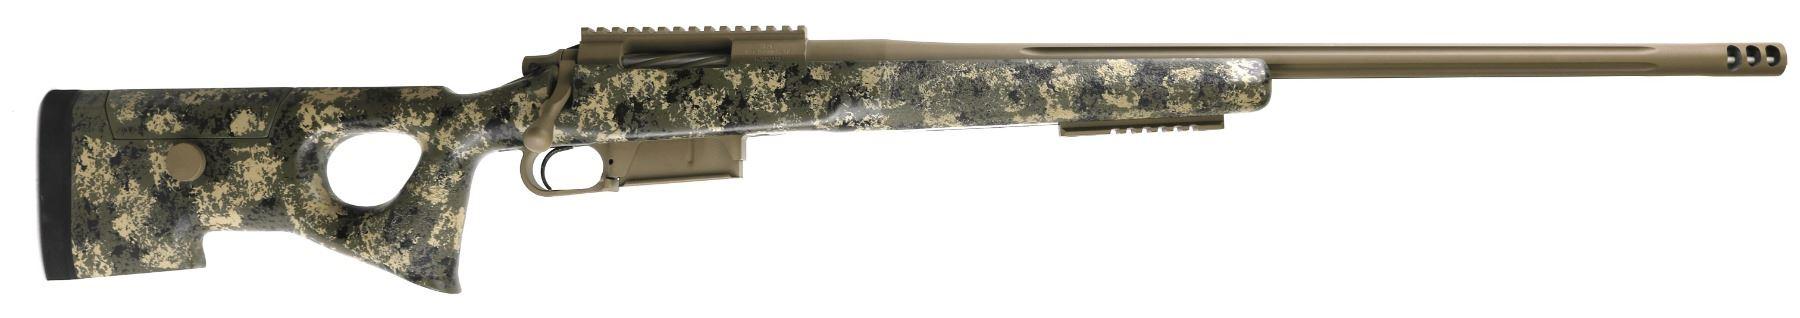 HILL COUNTRY RIFLES: Long-Range Tactical 6.5 Creedmoor Rifle